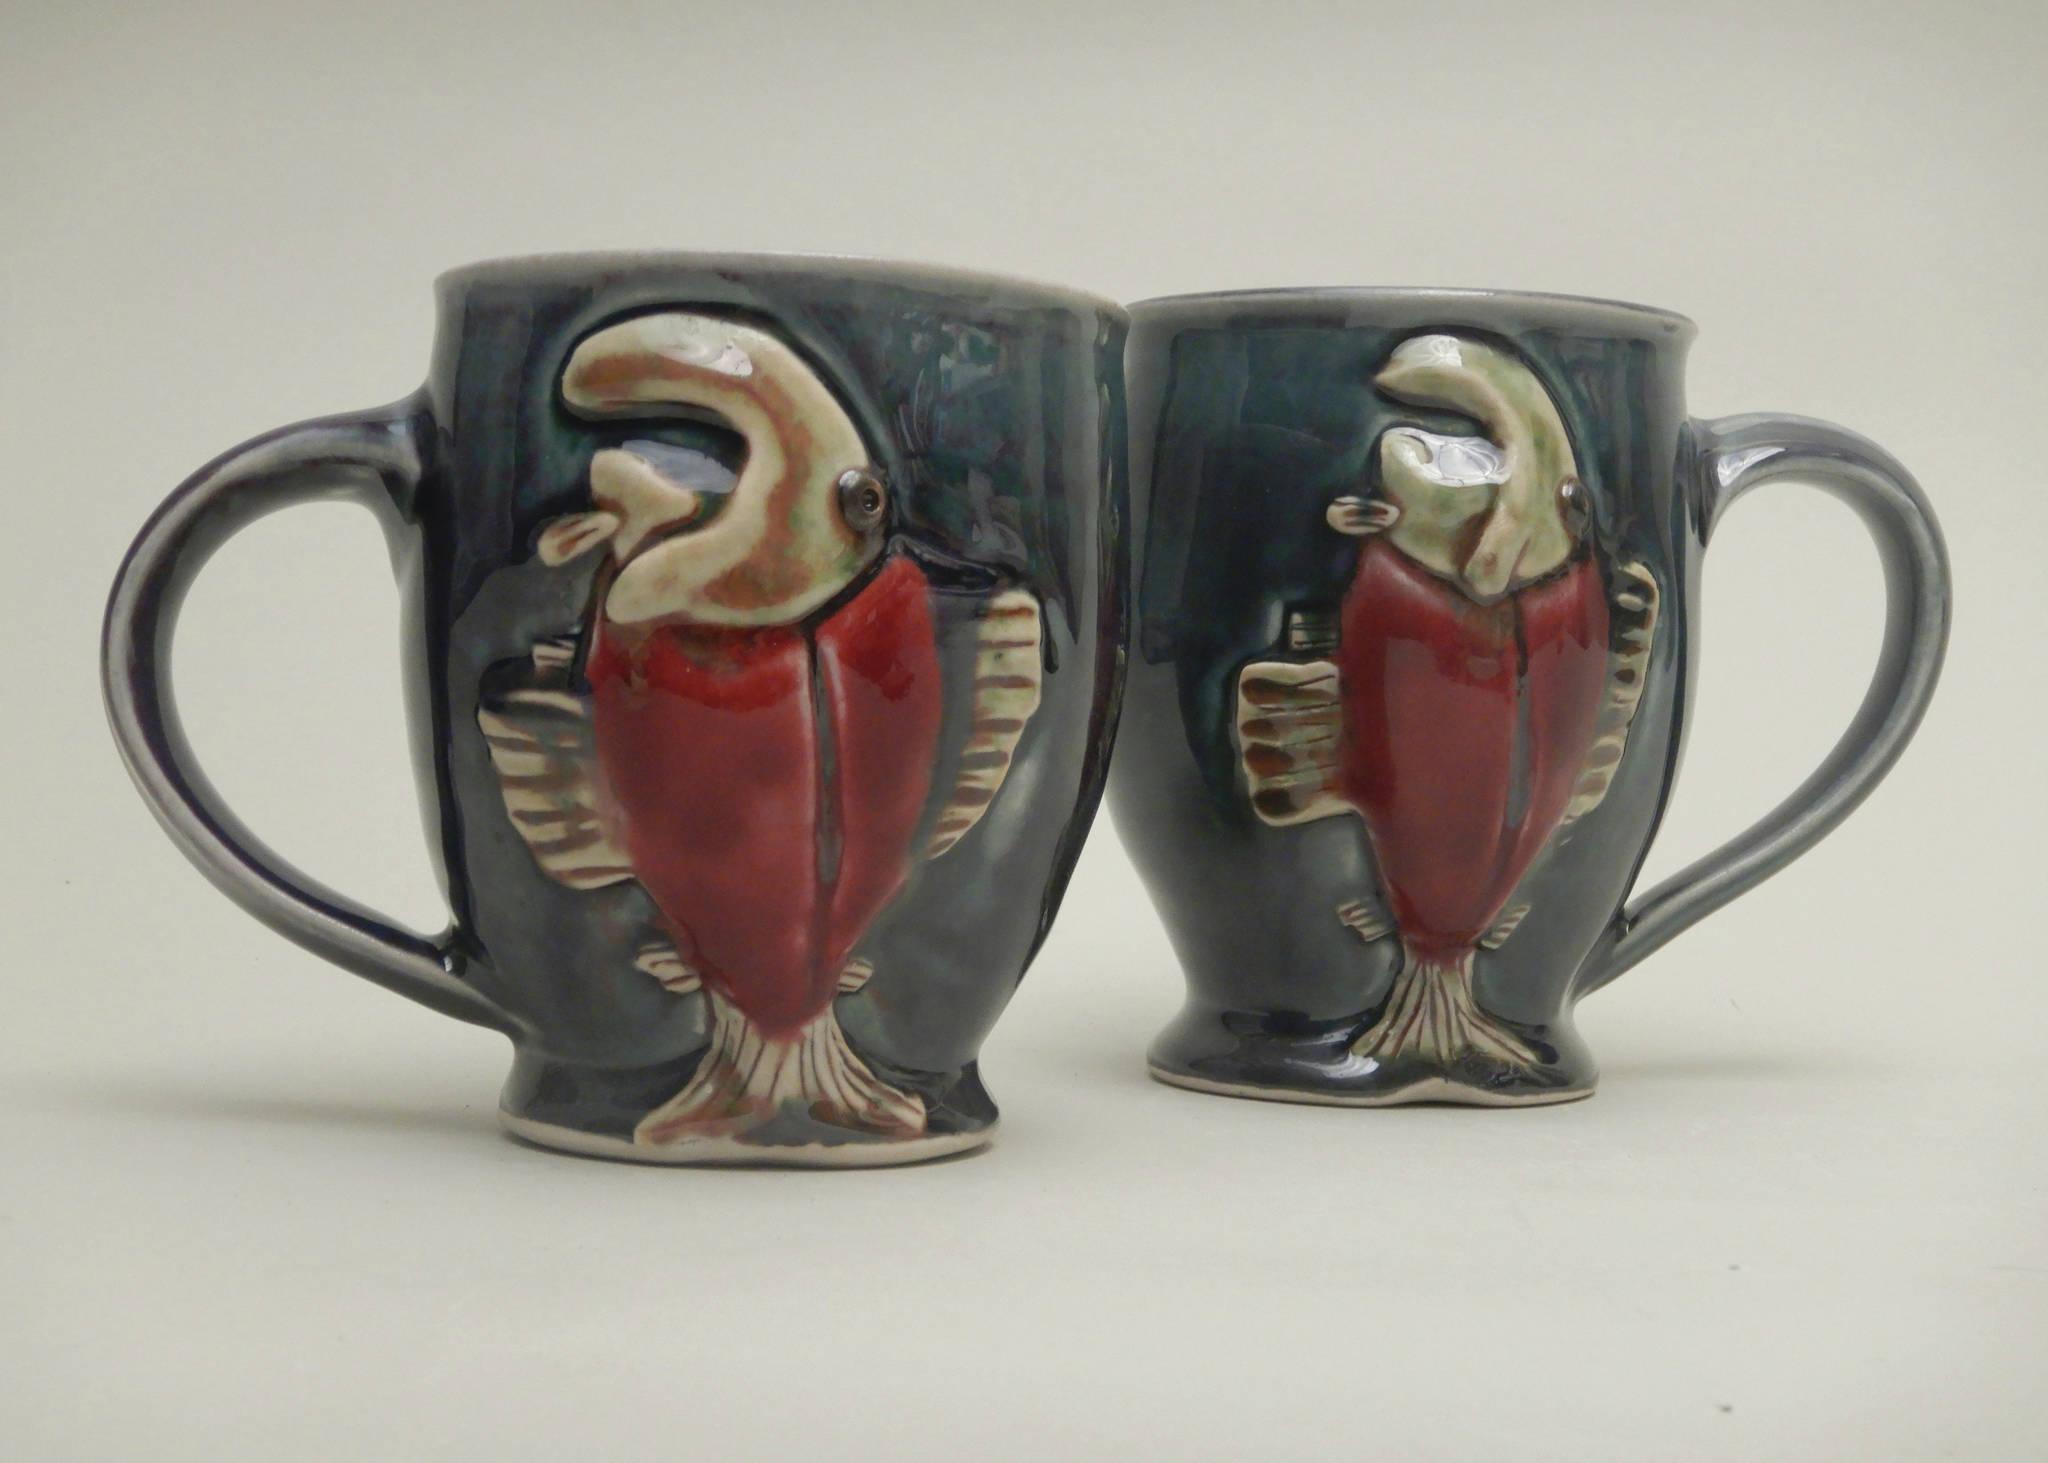 Kim Nielsen's pottery goes on exhibit Friday, Sept. 3, 2021, at Ptarmigan Arts in Homer, Alaska. (Photo courtesy of Ptarmigan Arts)